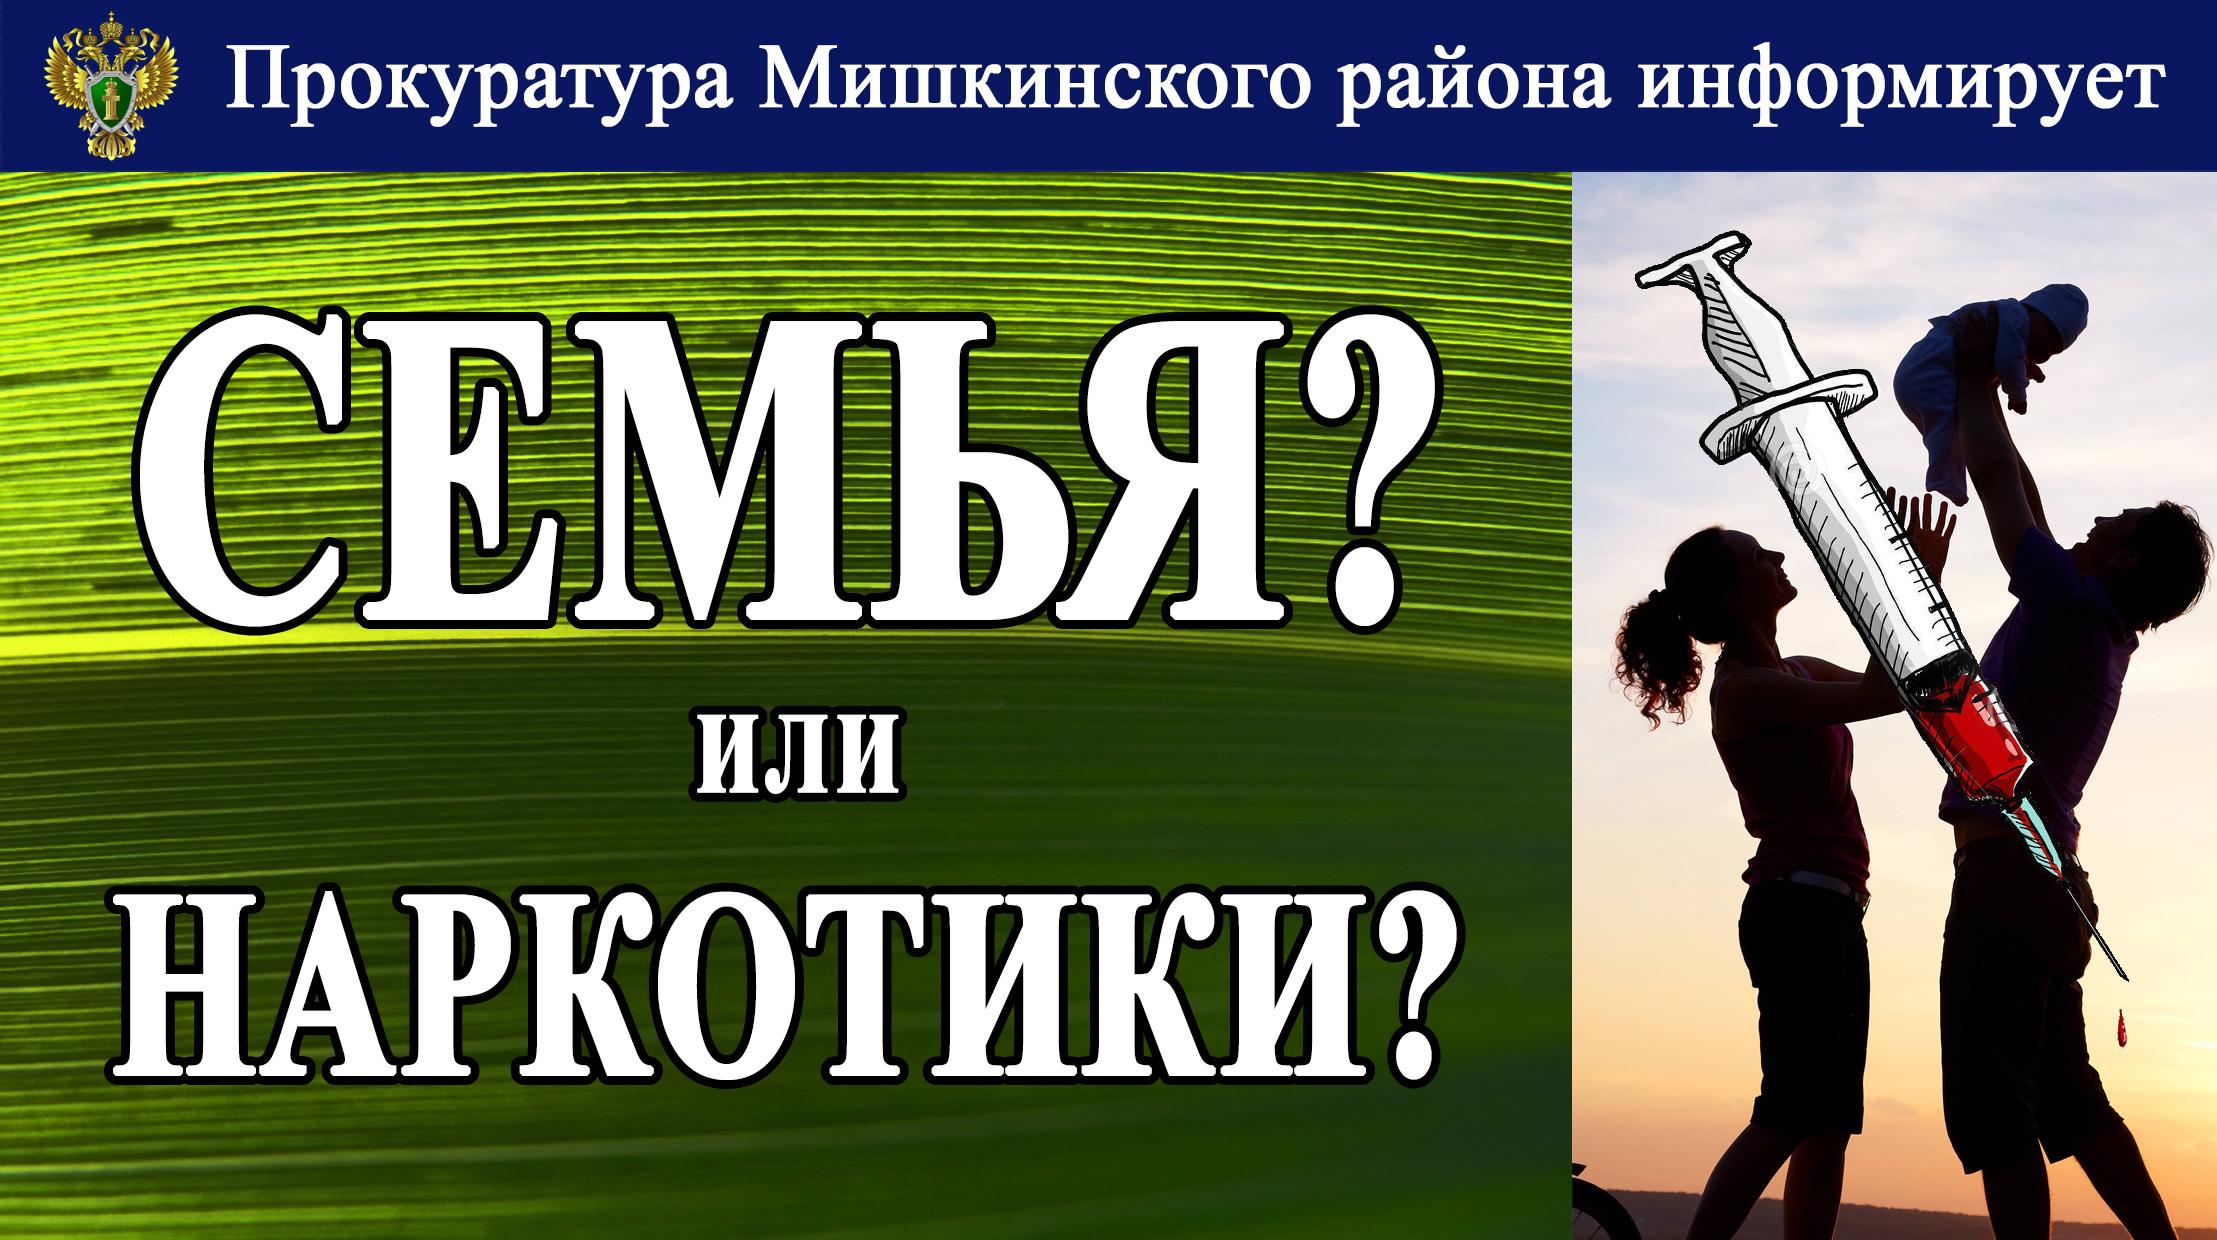 http://mishkino-obr.ucoz.ru/soc_reklama_protiv_narkotikov_semja_2.jpg